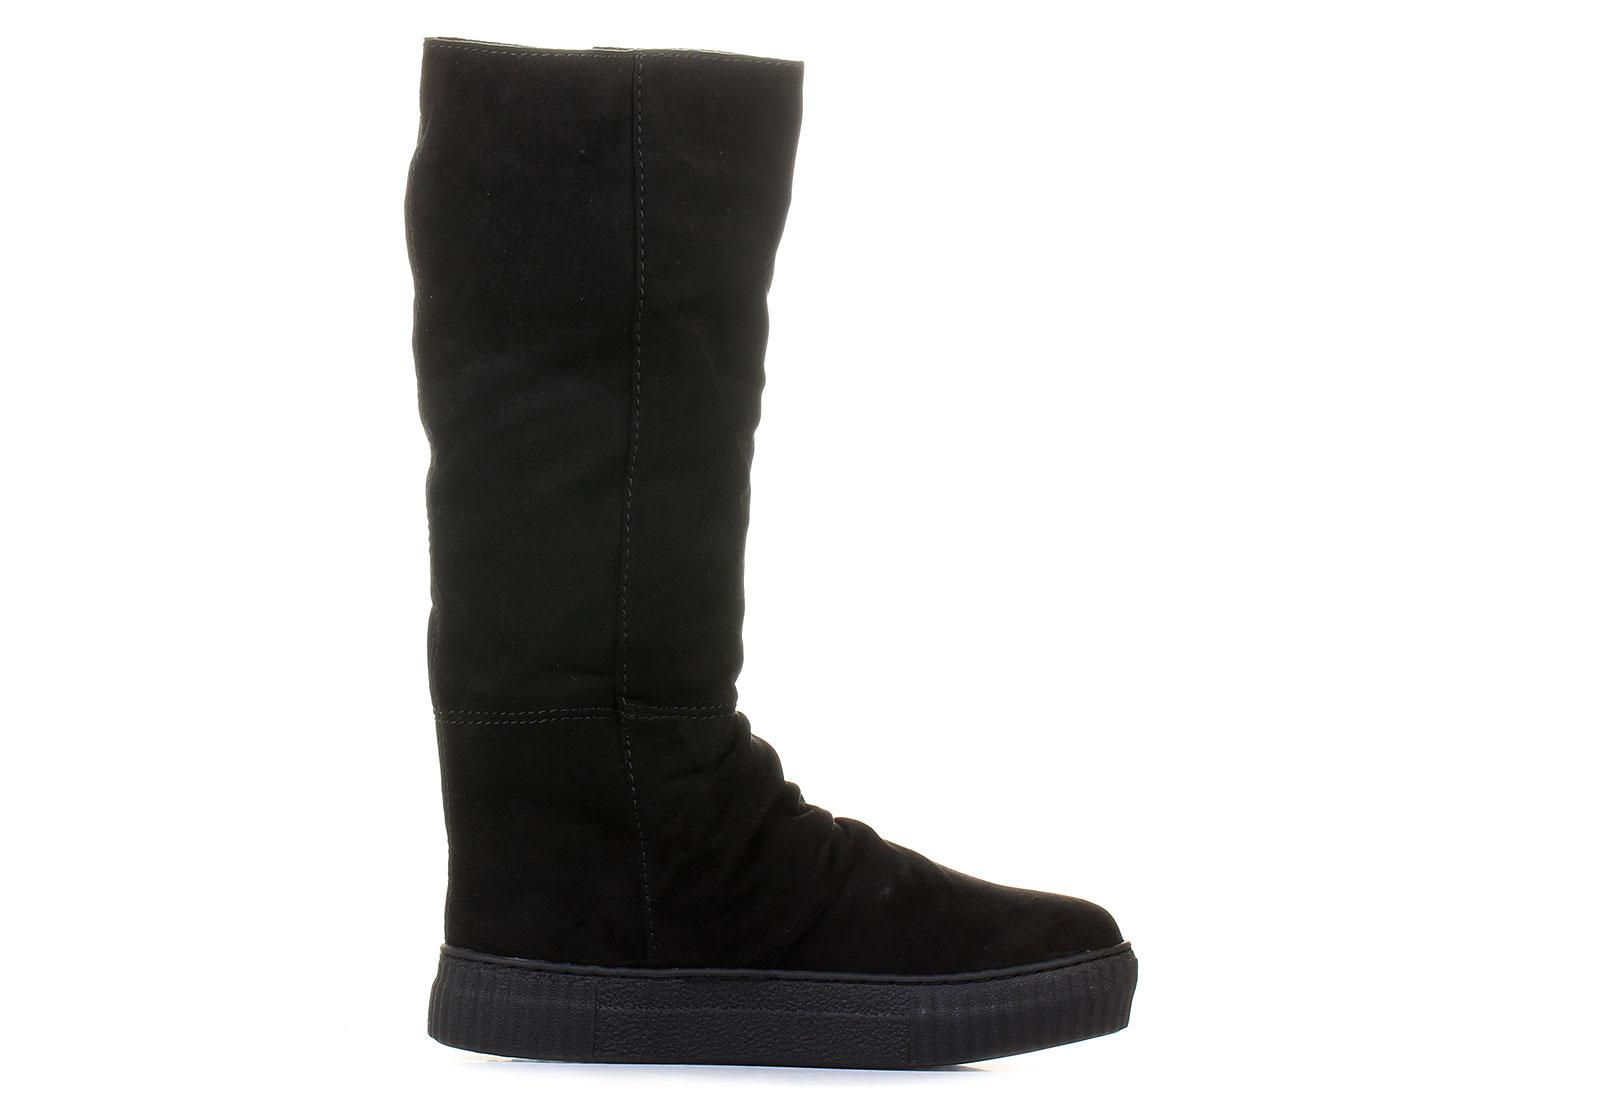 b7deb869d2 Blink Casual Crna Čizme - Čizma - Office Shoes - Online prodavnica obuće